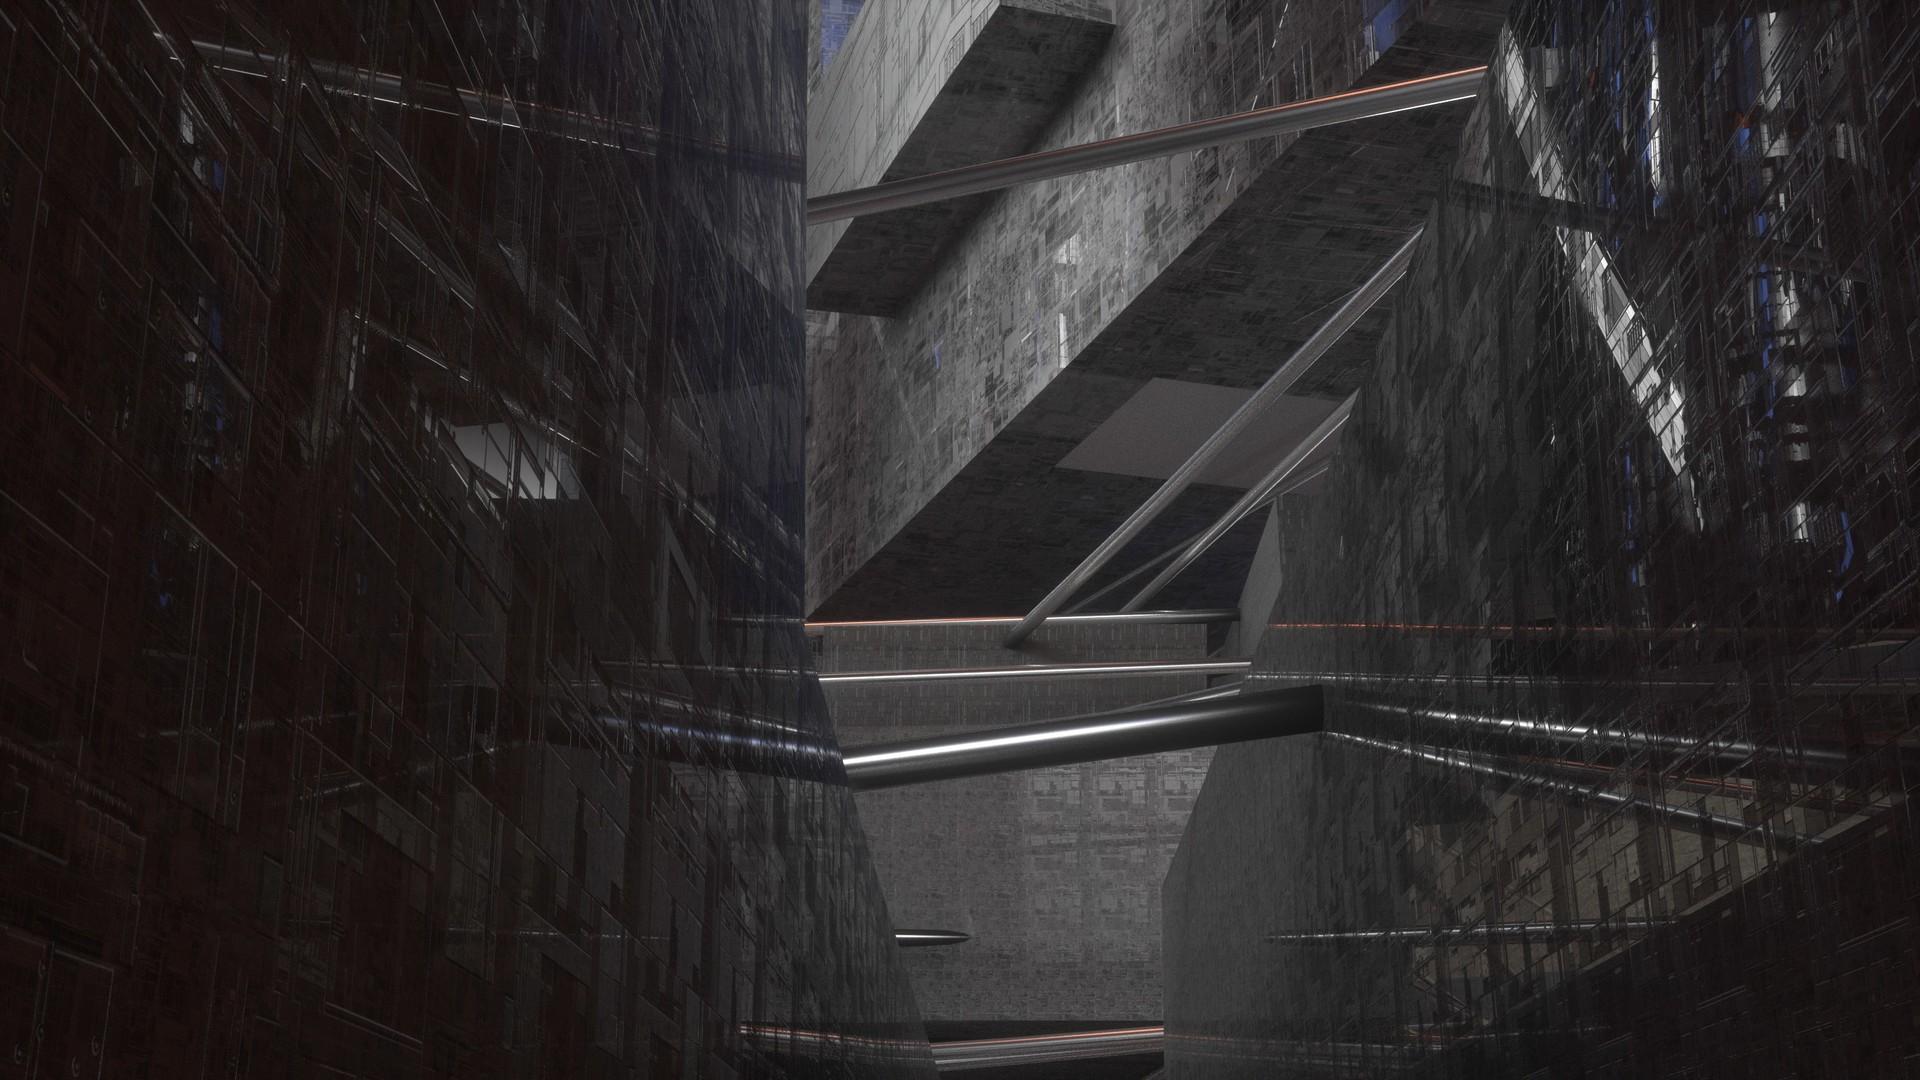 Kresimir jelusic robob3ar 187 130416 architecture